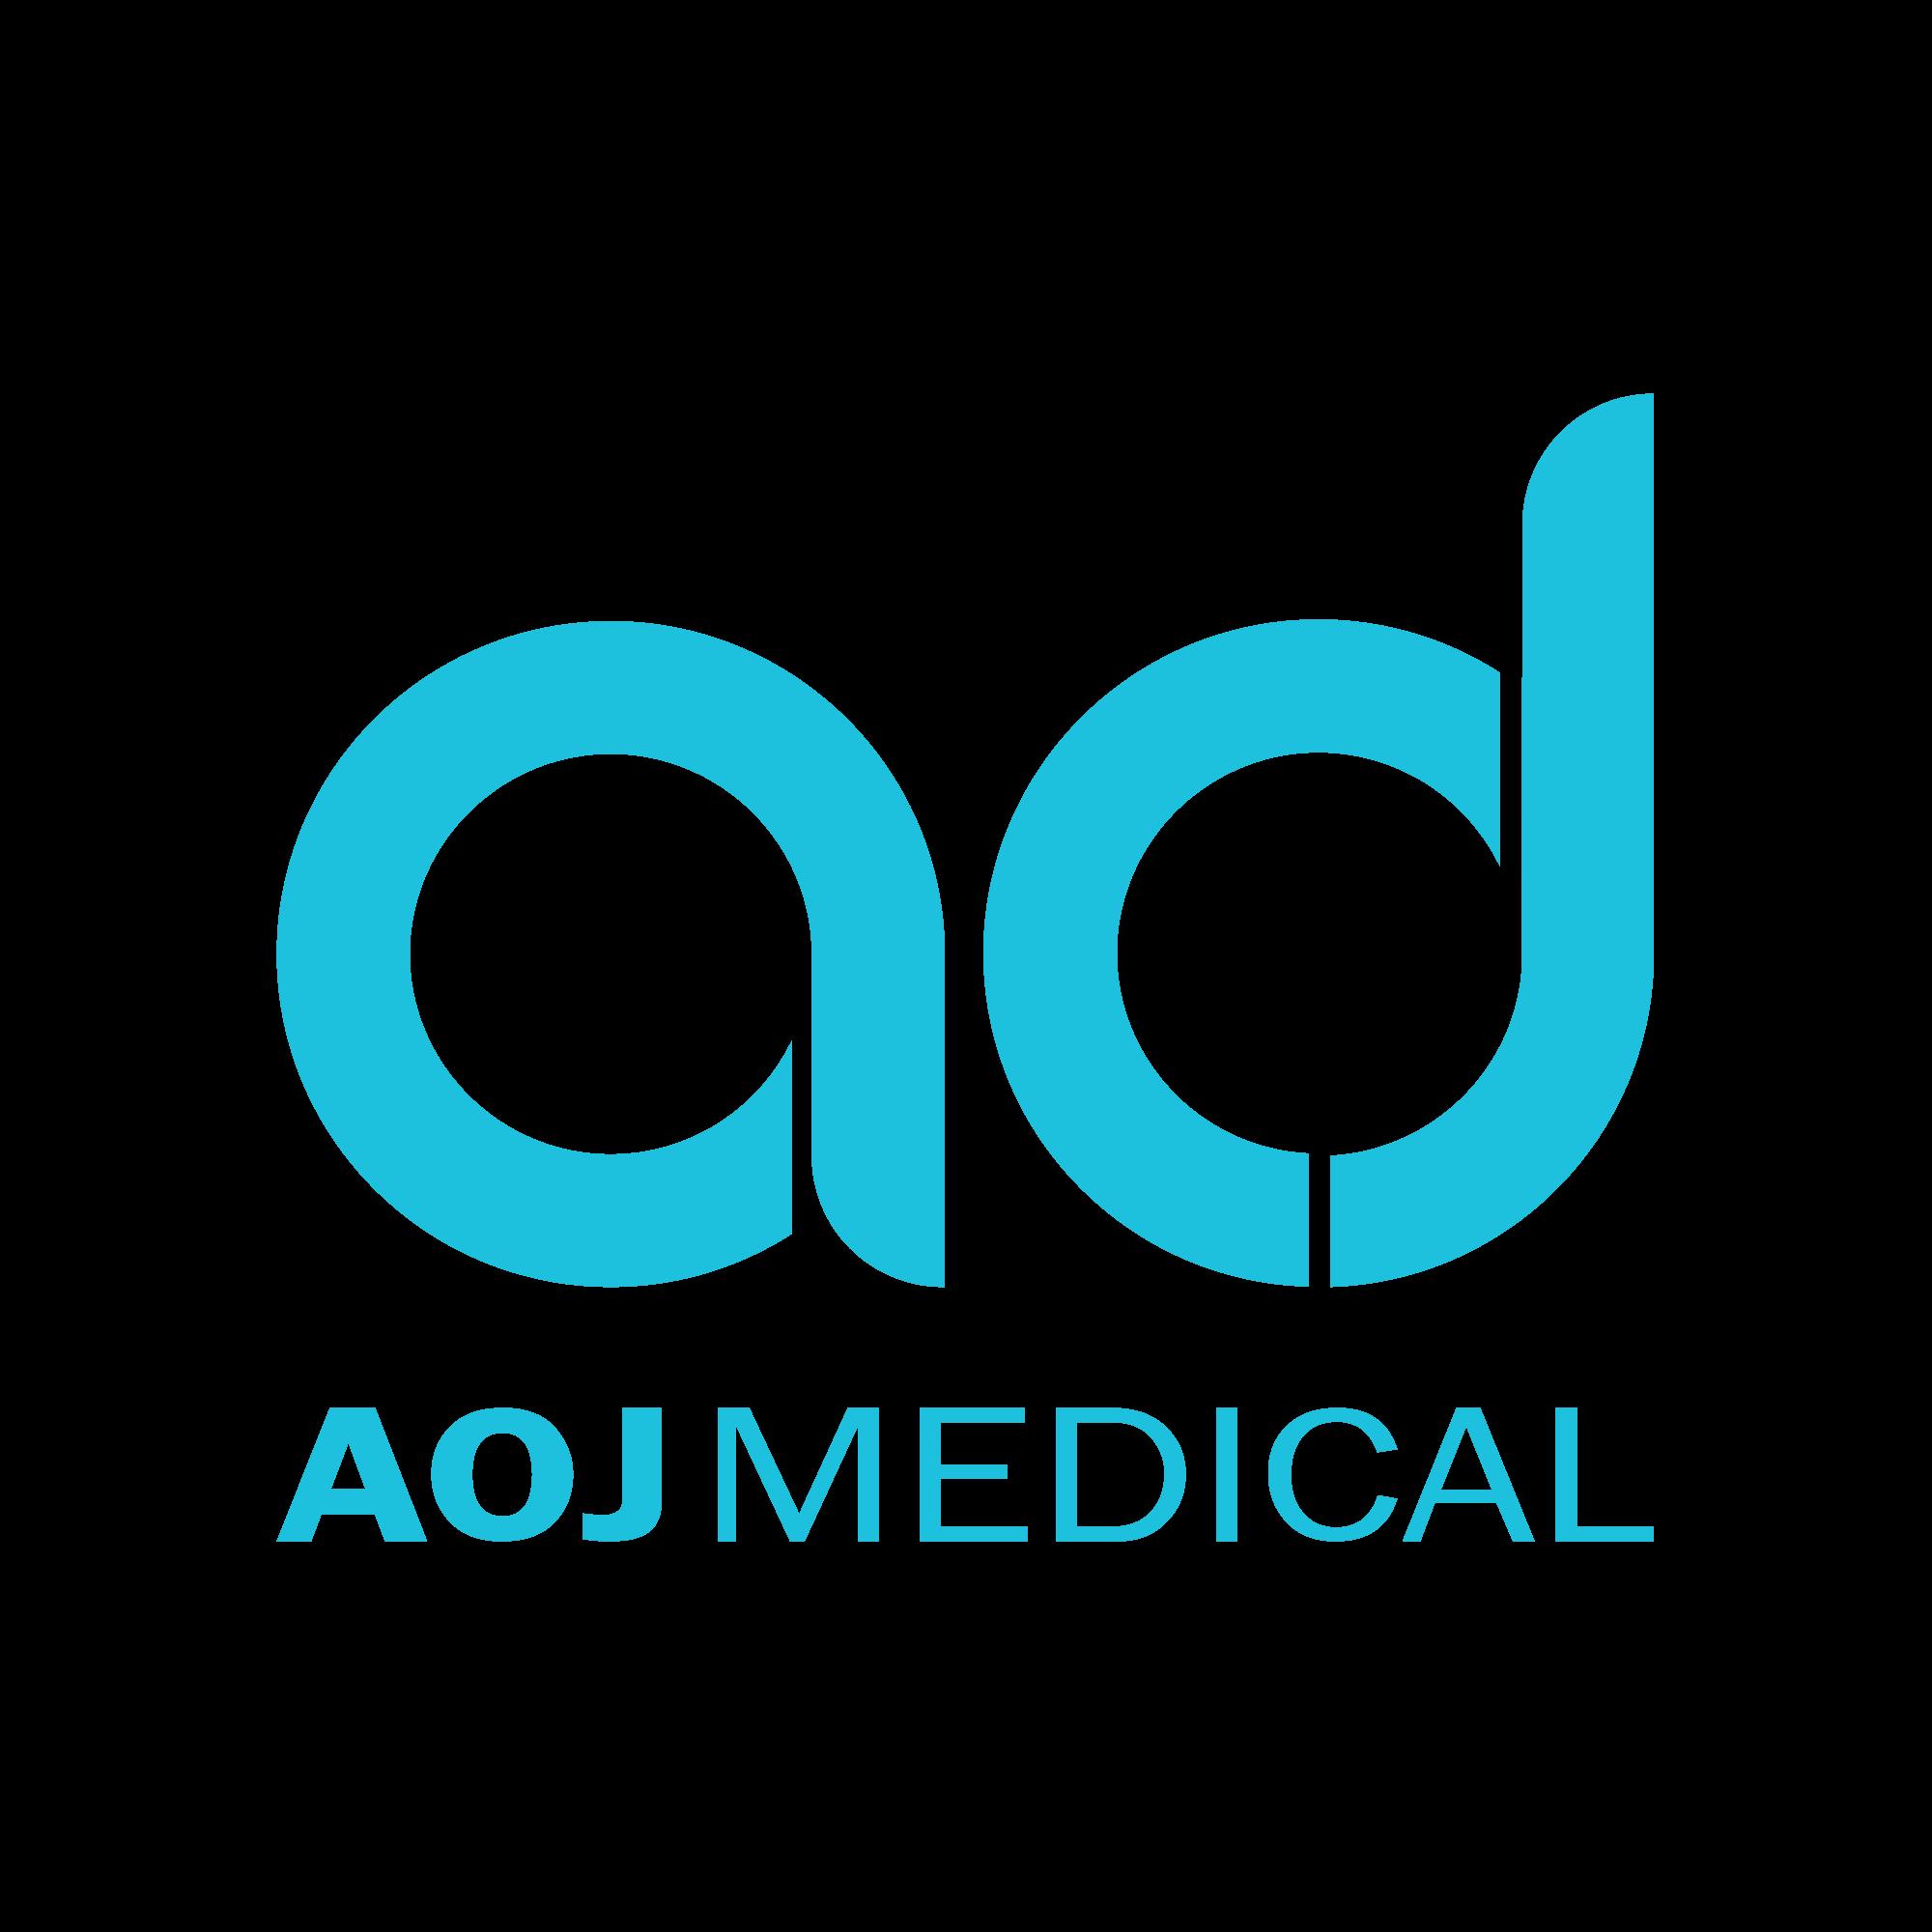 AOJ MEDICAL